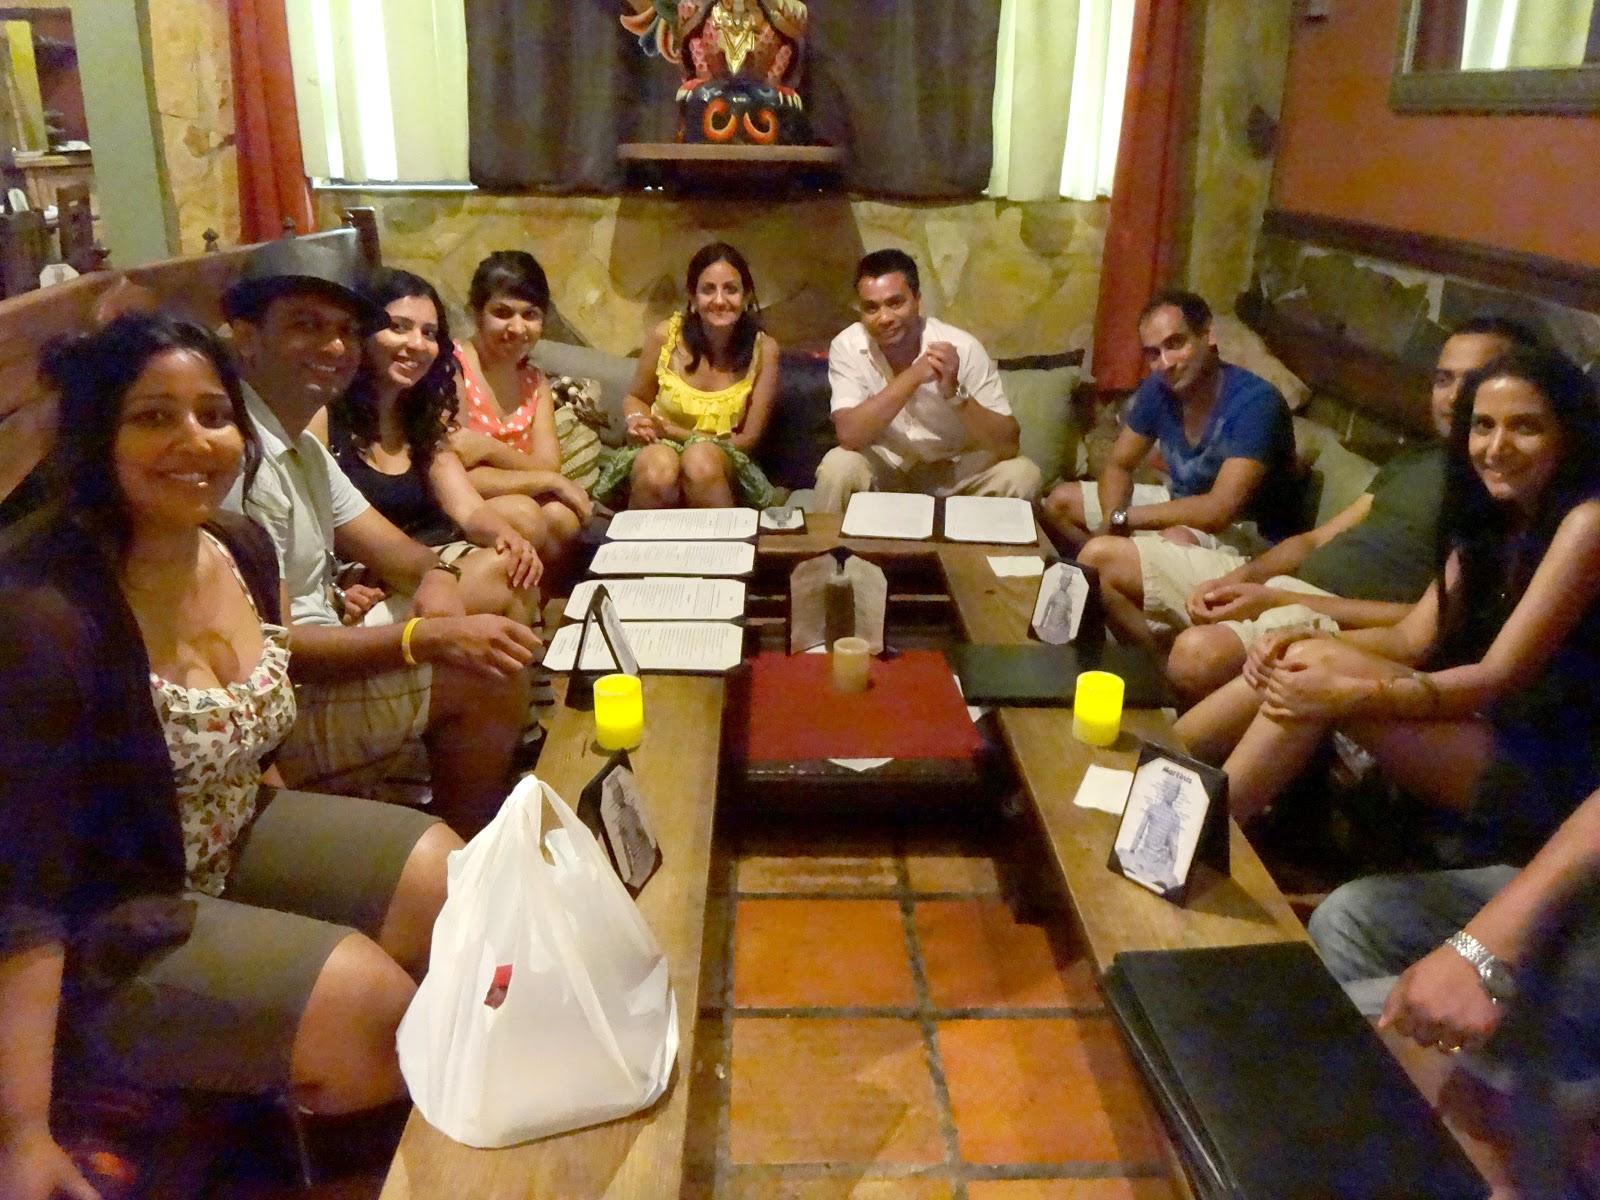 Tantra Indian Restaurant Ocala Fl